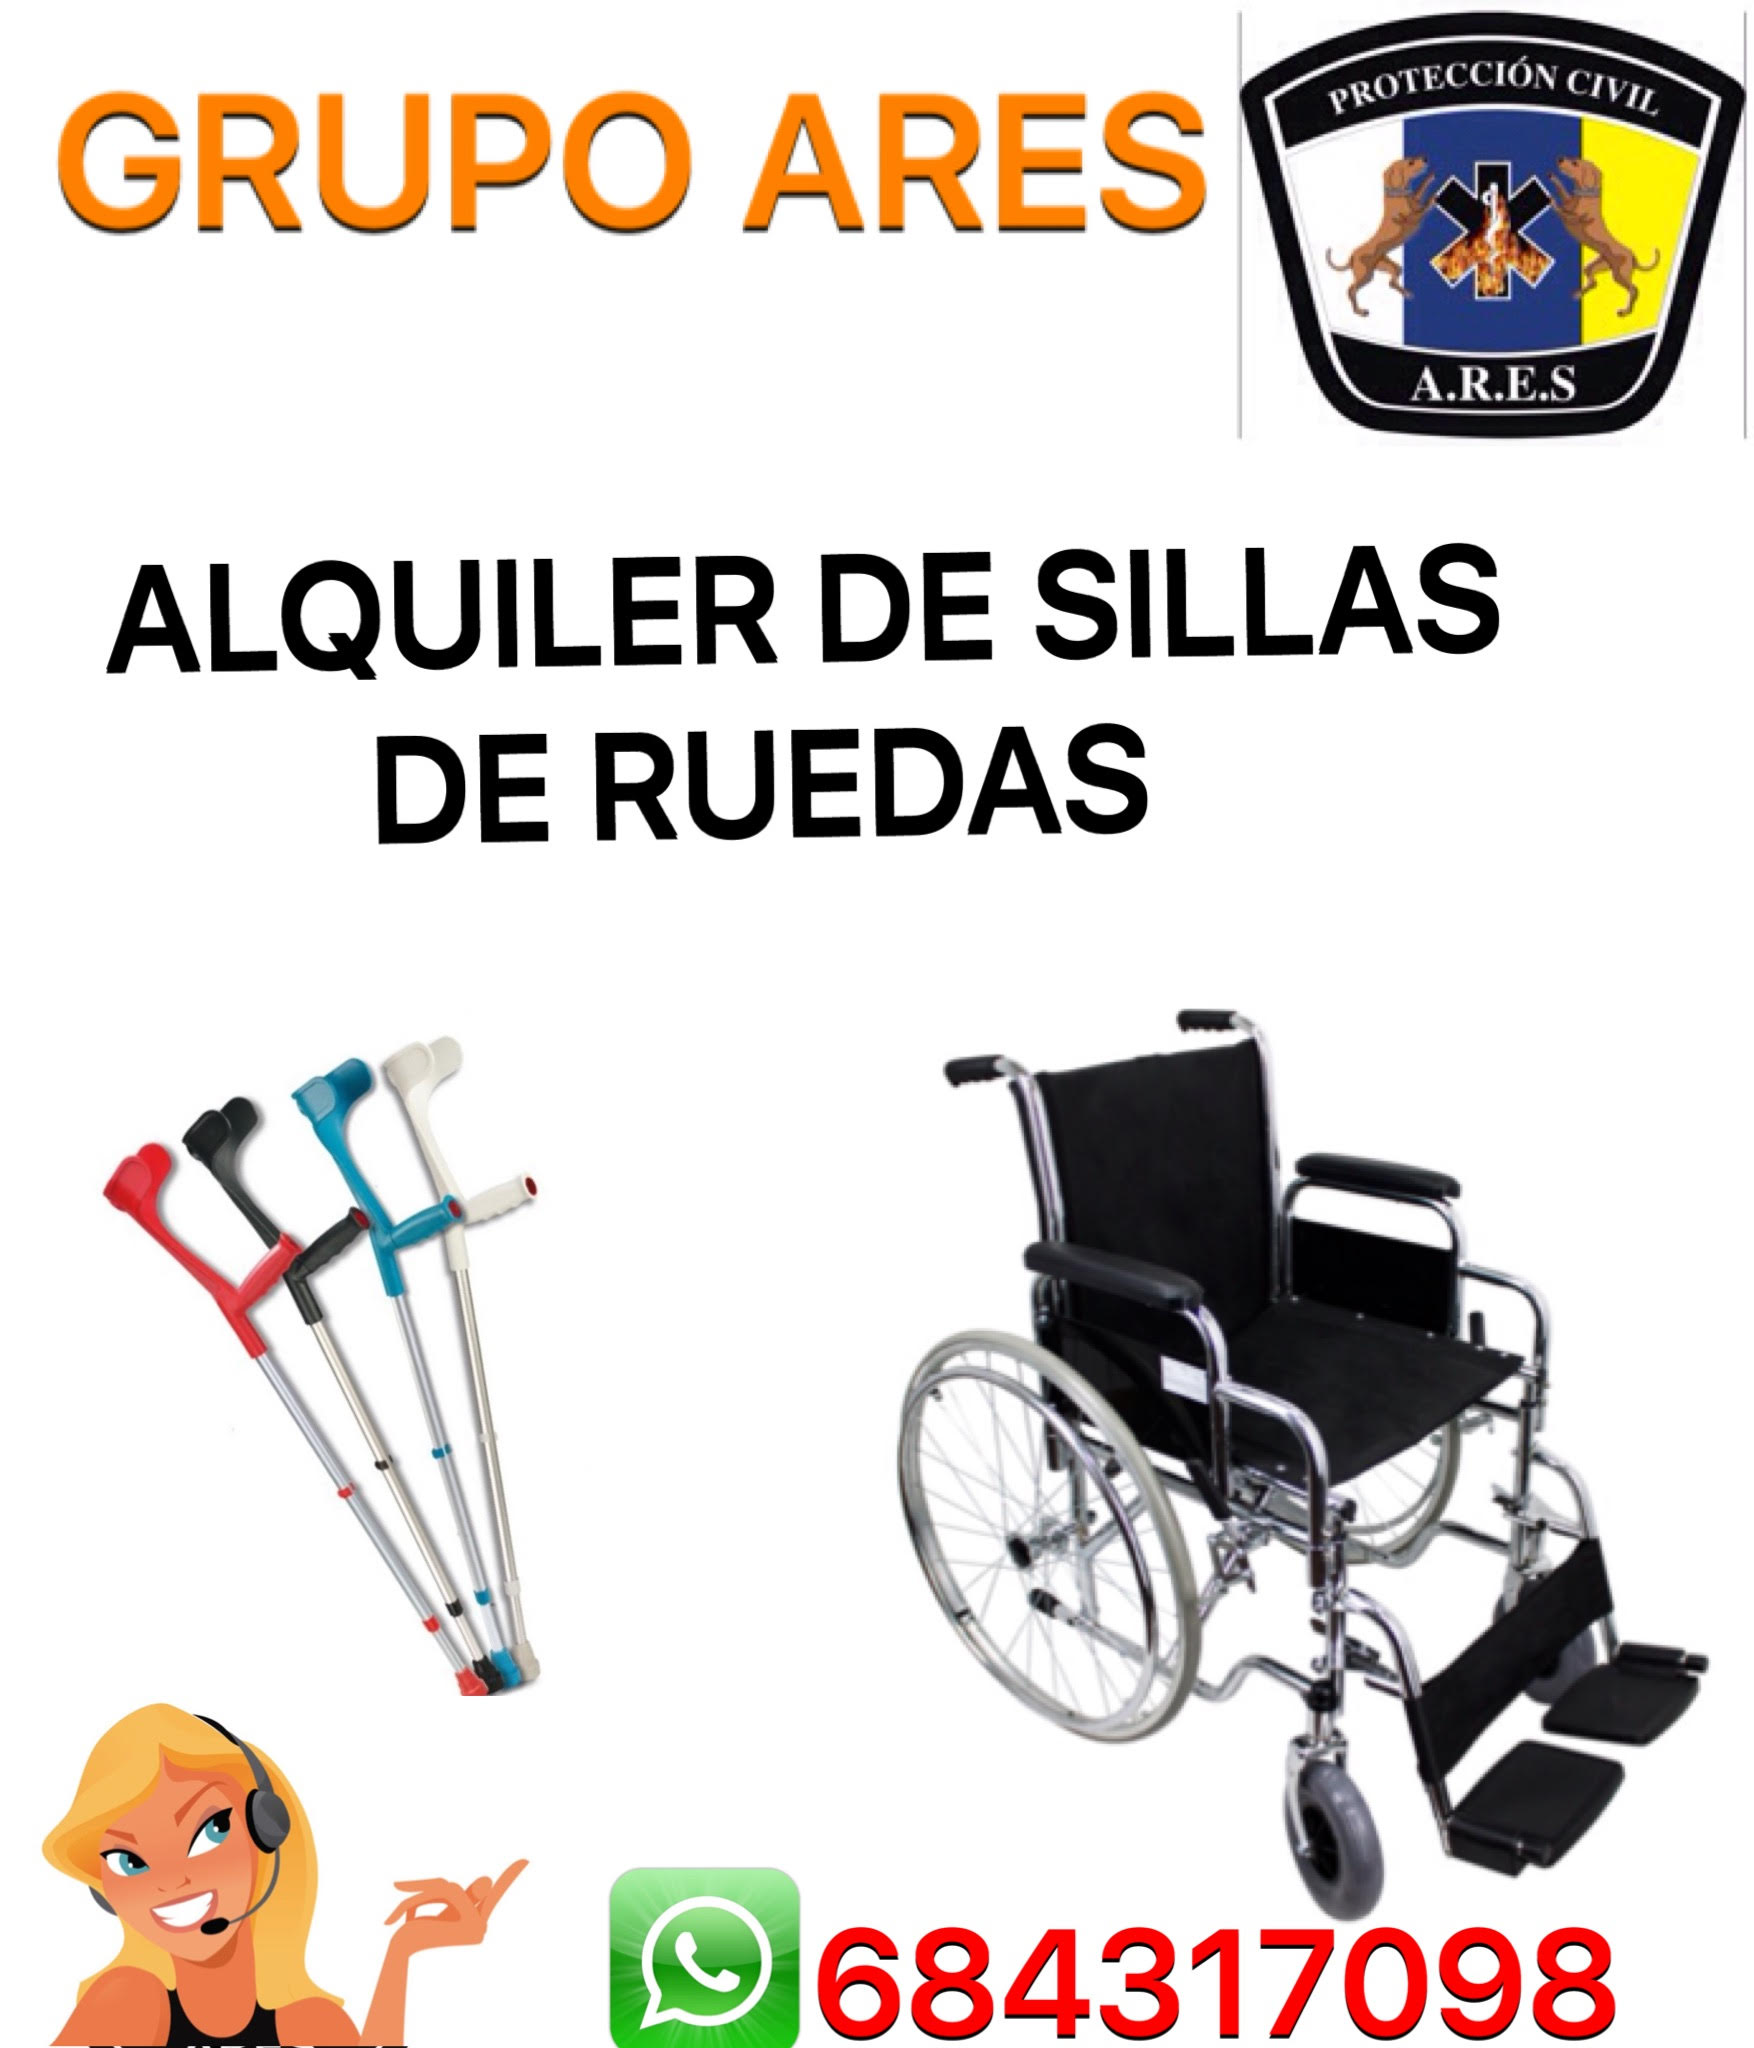 Alquiler de sillas de ruedas aresservicios for Pisos de alquiler en silla